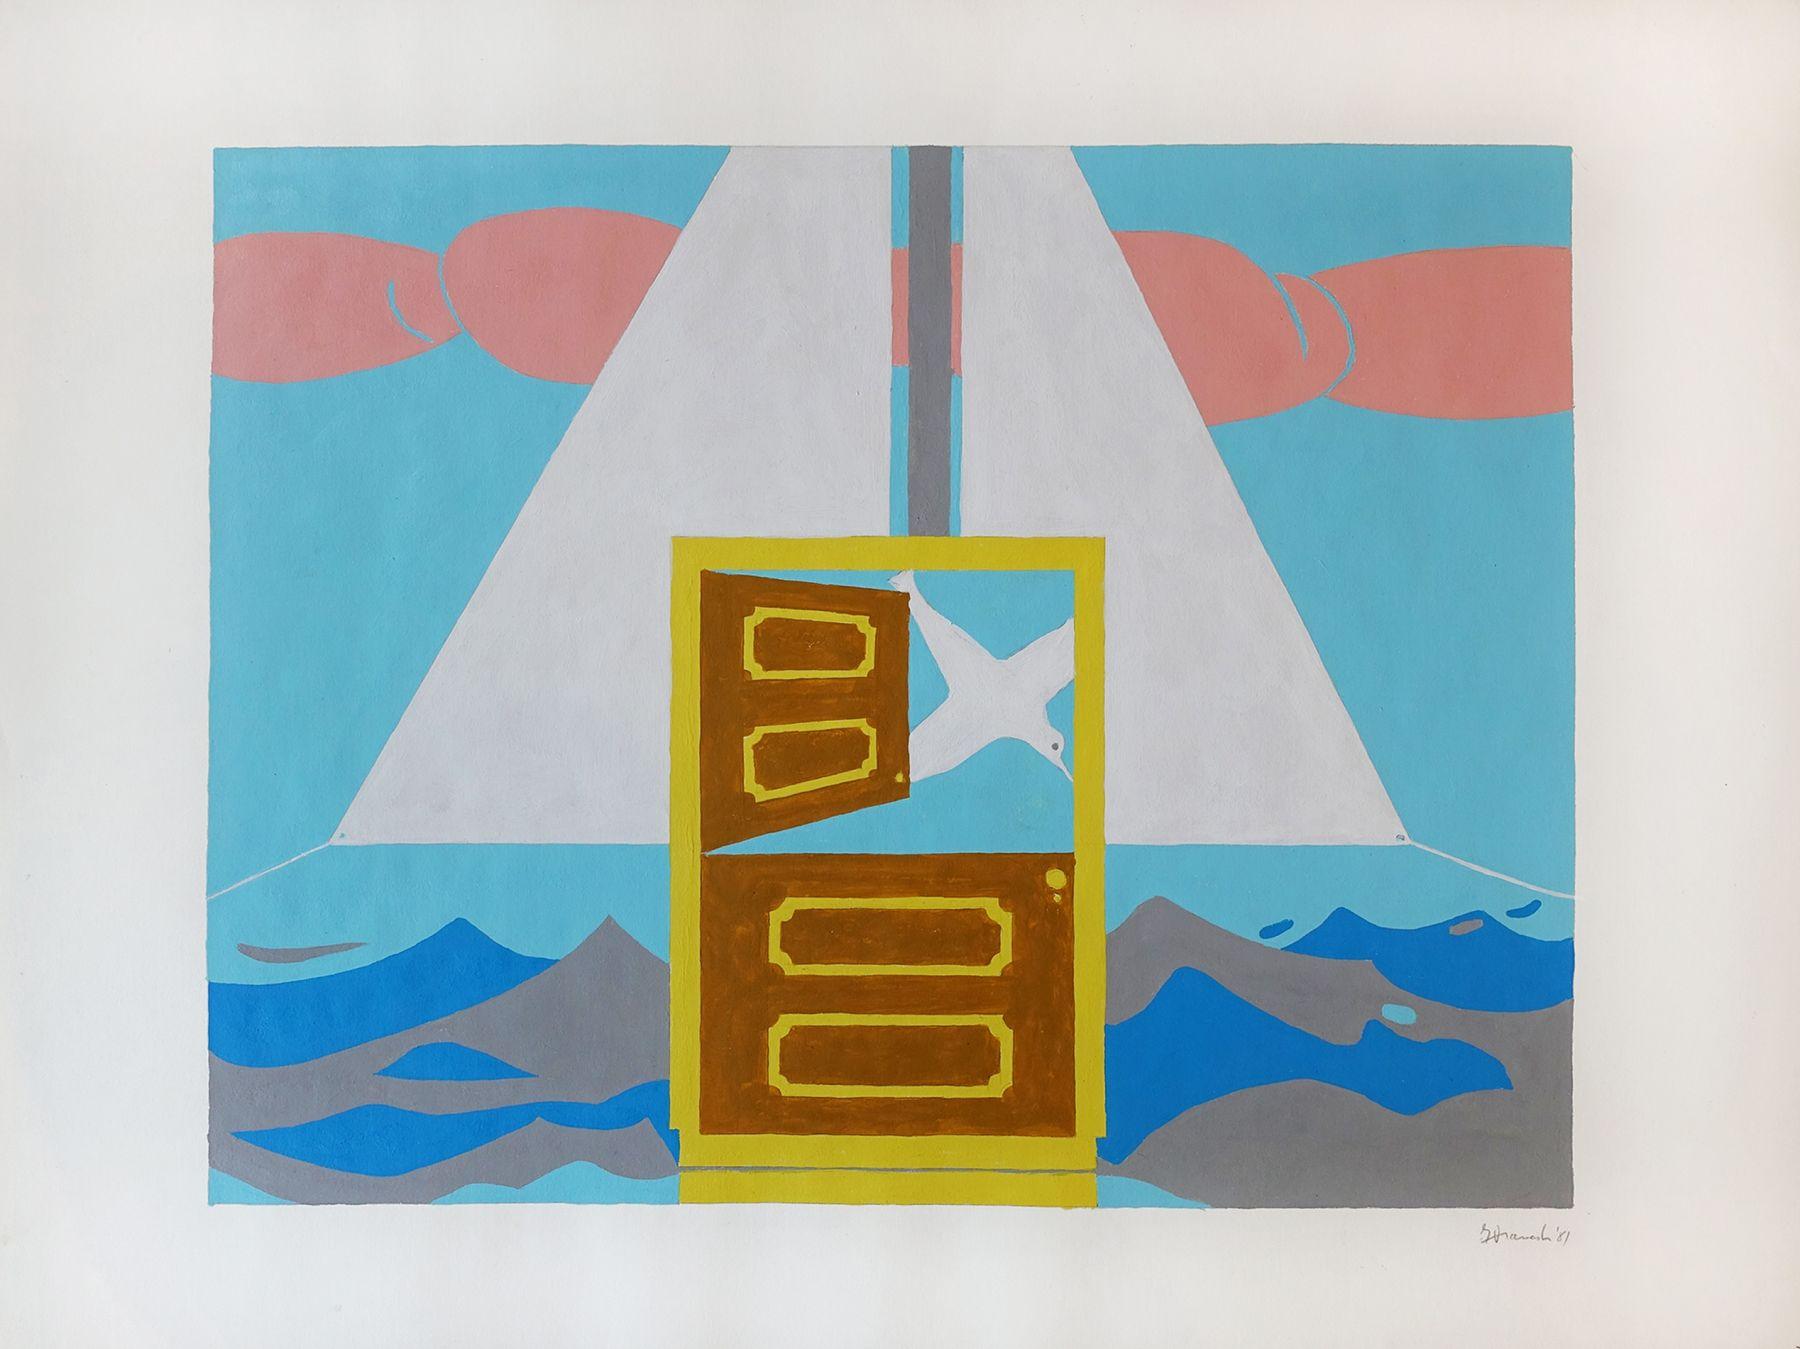 George Vranesh (1926-2014) Untitled (Surreal Sail), 1981